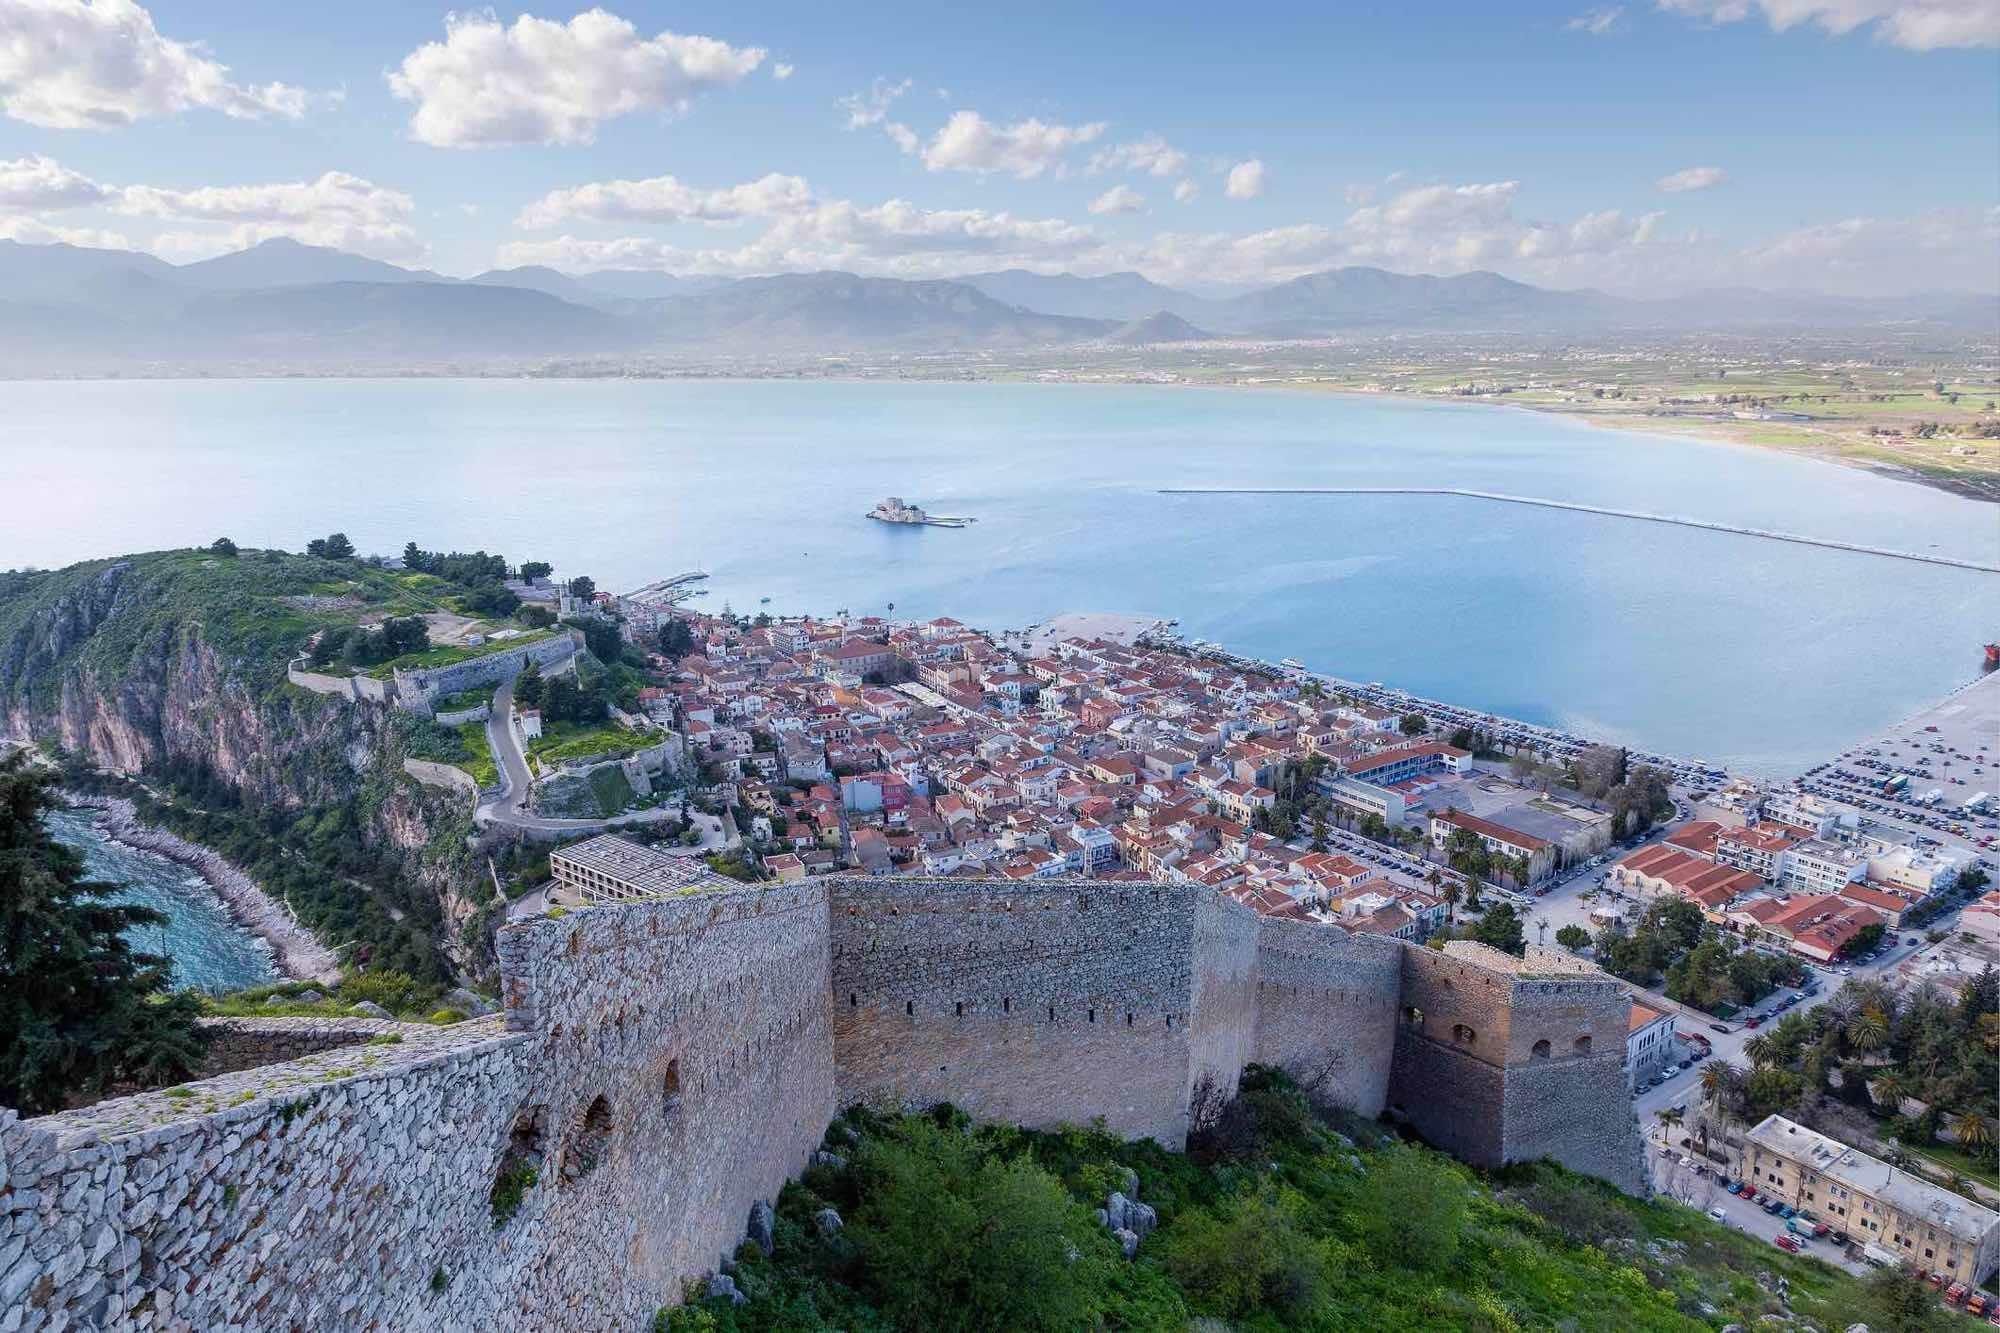 Classical Tour & Meteora - 5 Days